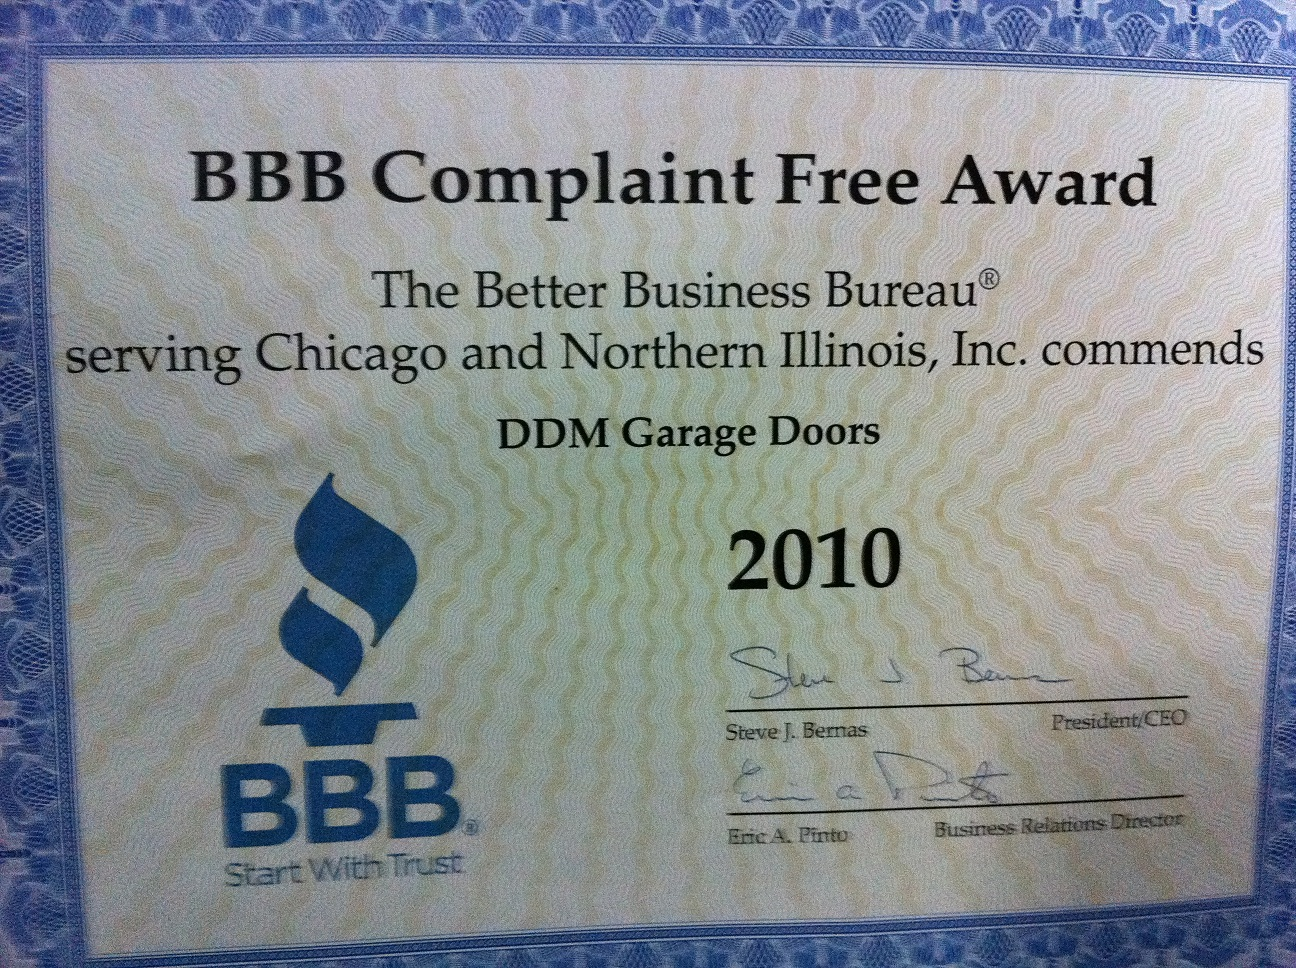 ddm garage doors0044jpg